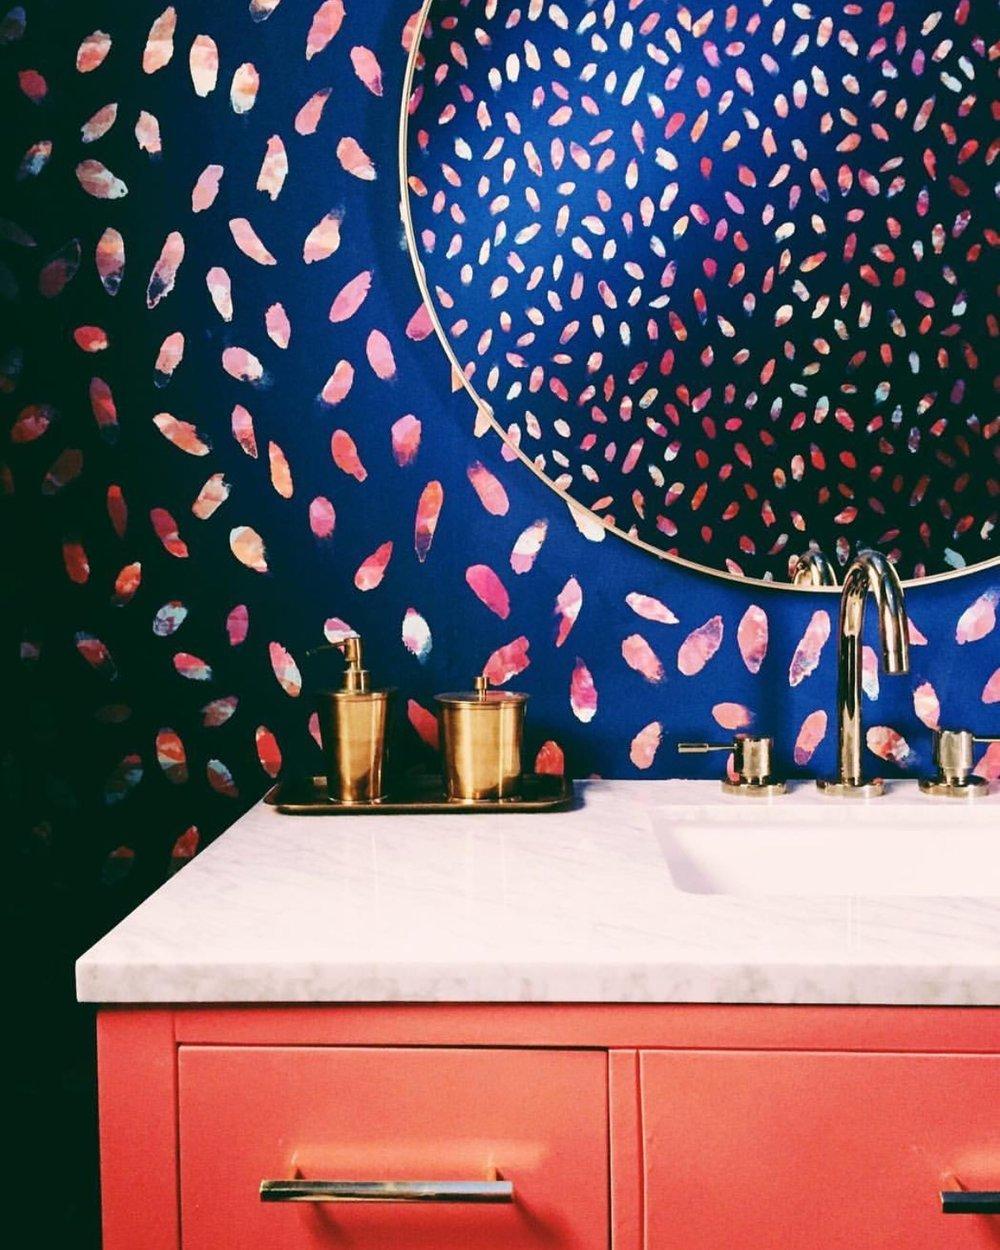 Cheerful modern bathroom featuring